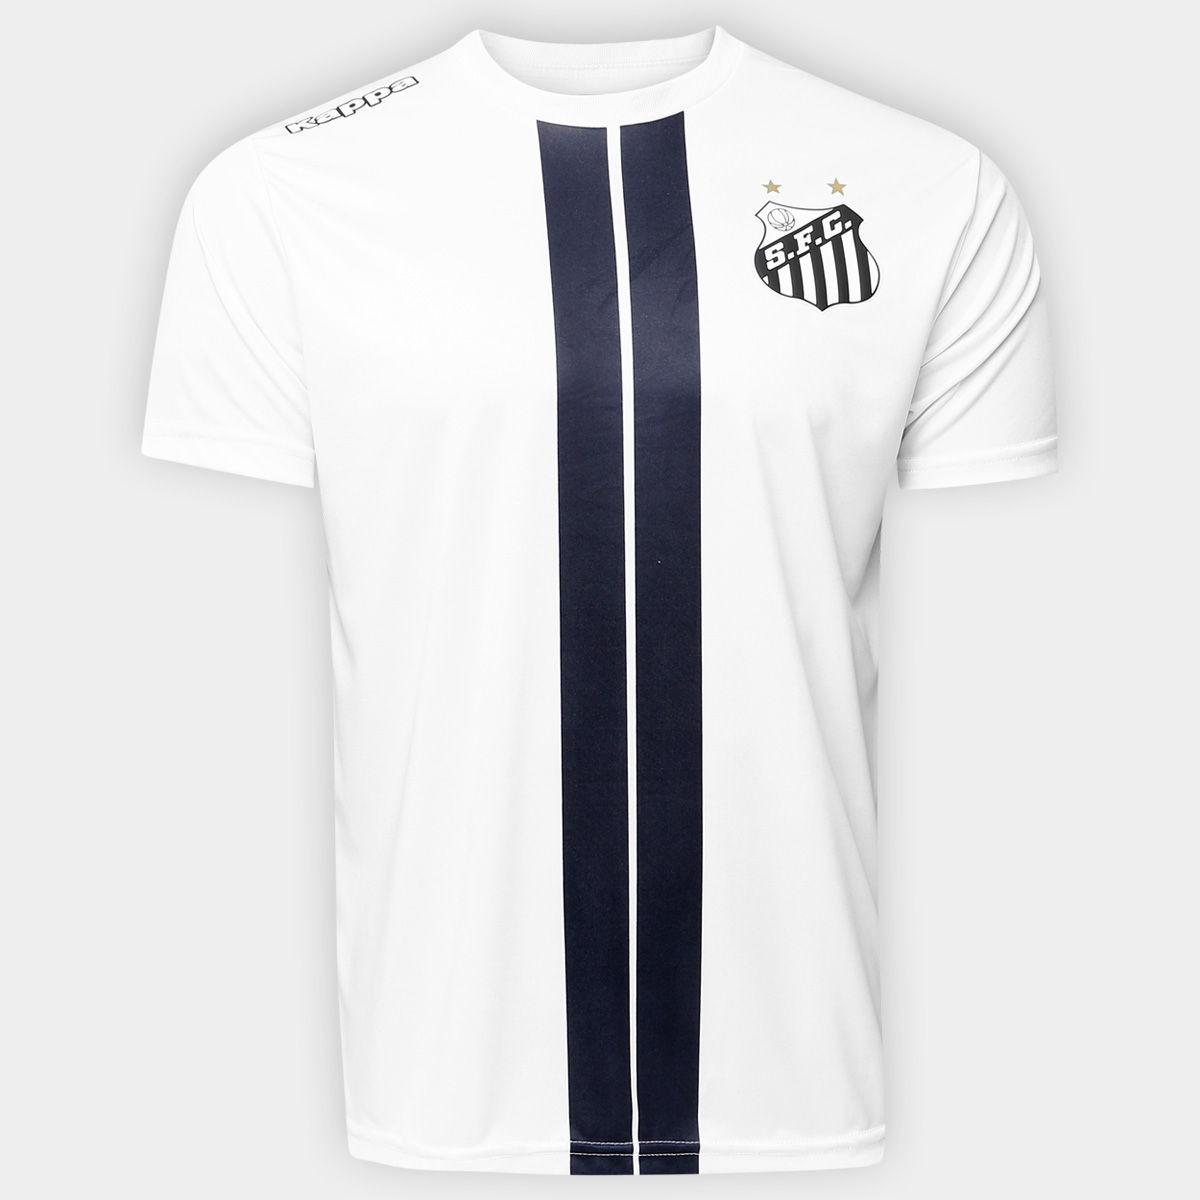 af783fd7b1 Camisa Santos Kappa Branca Masculina Original Dorval Peixe - R  120 ...